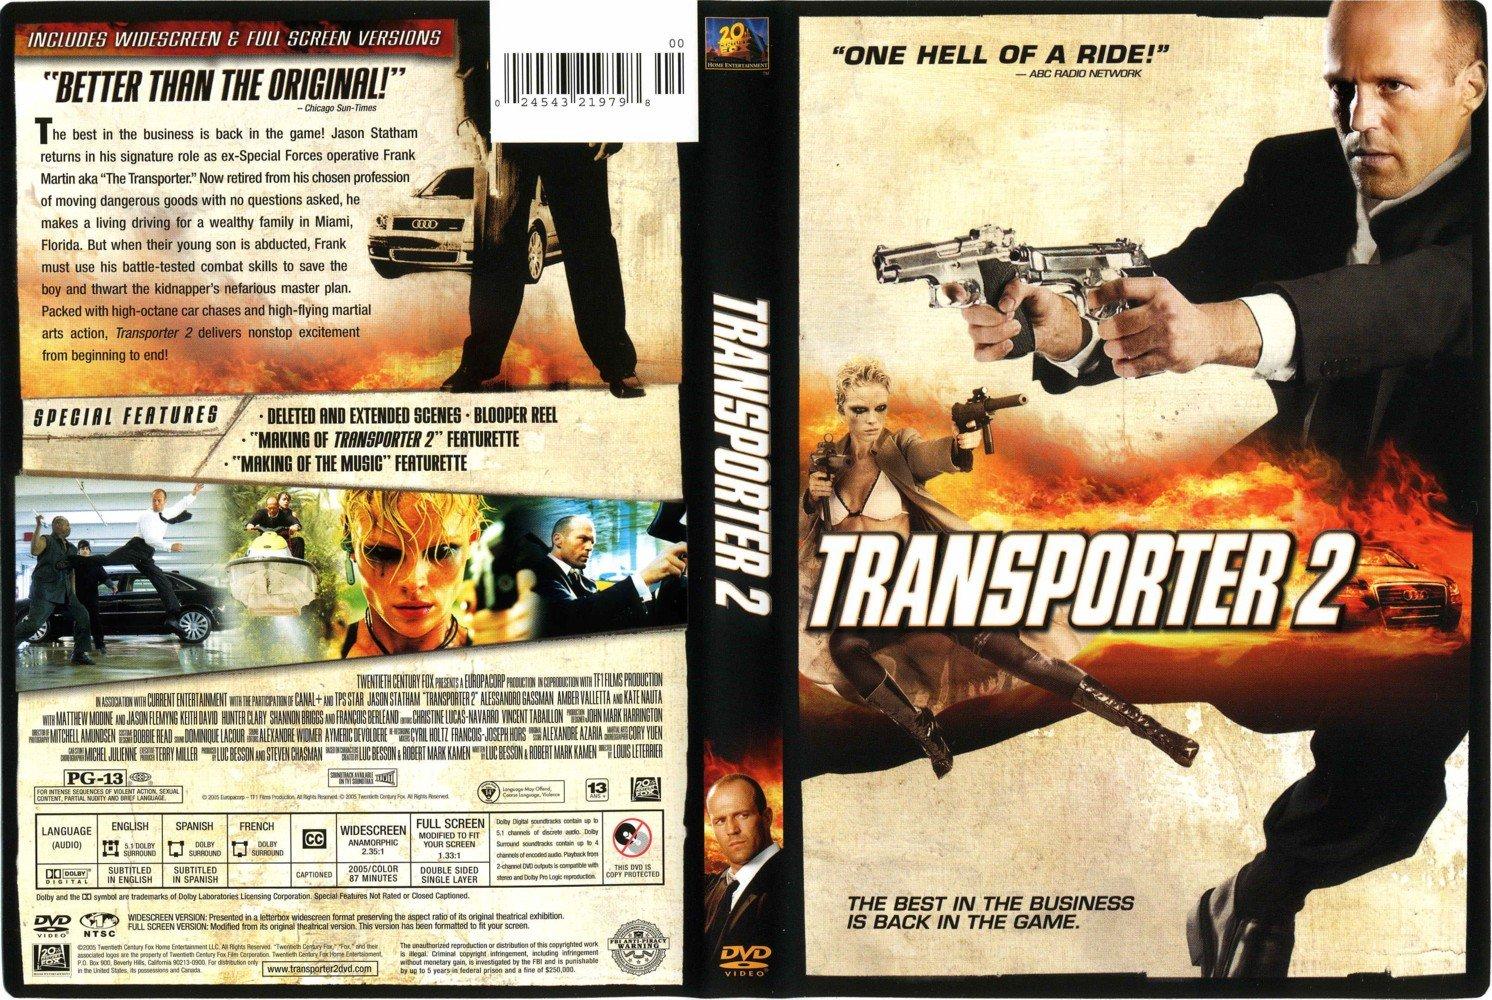 http://2.bp.blogspot.com/_-x-5Smo6aMo/TSdsHbklcPI/AAAAAAAABQk/U-lD5tnwnHM/s1600/Transporter_2-front.jpg